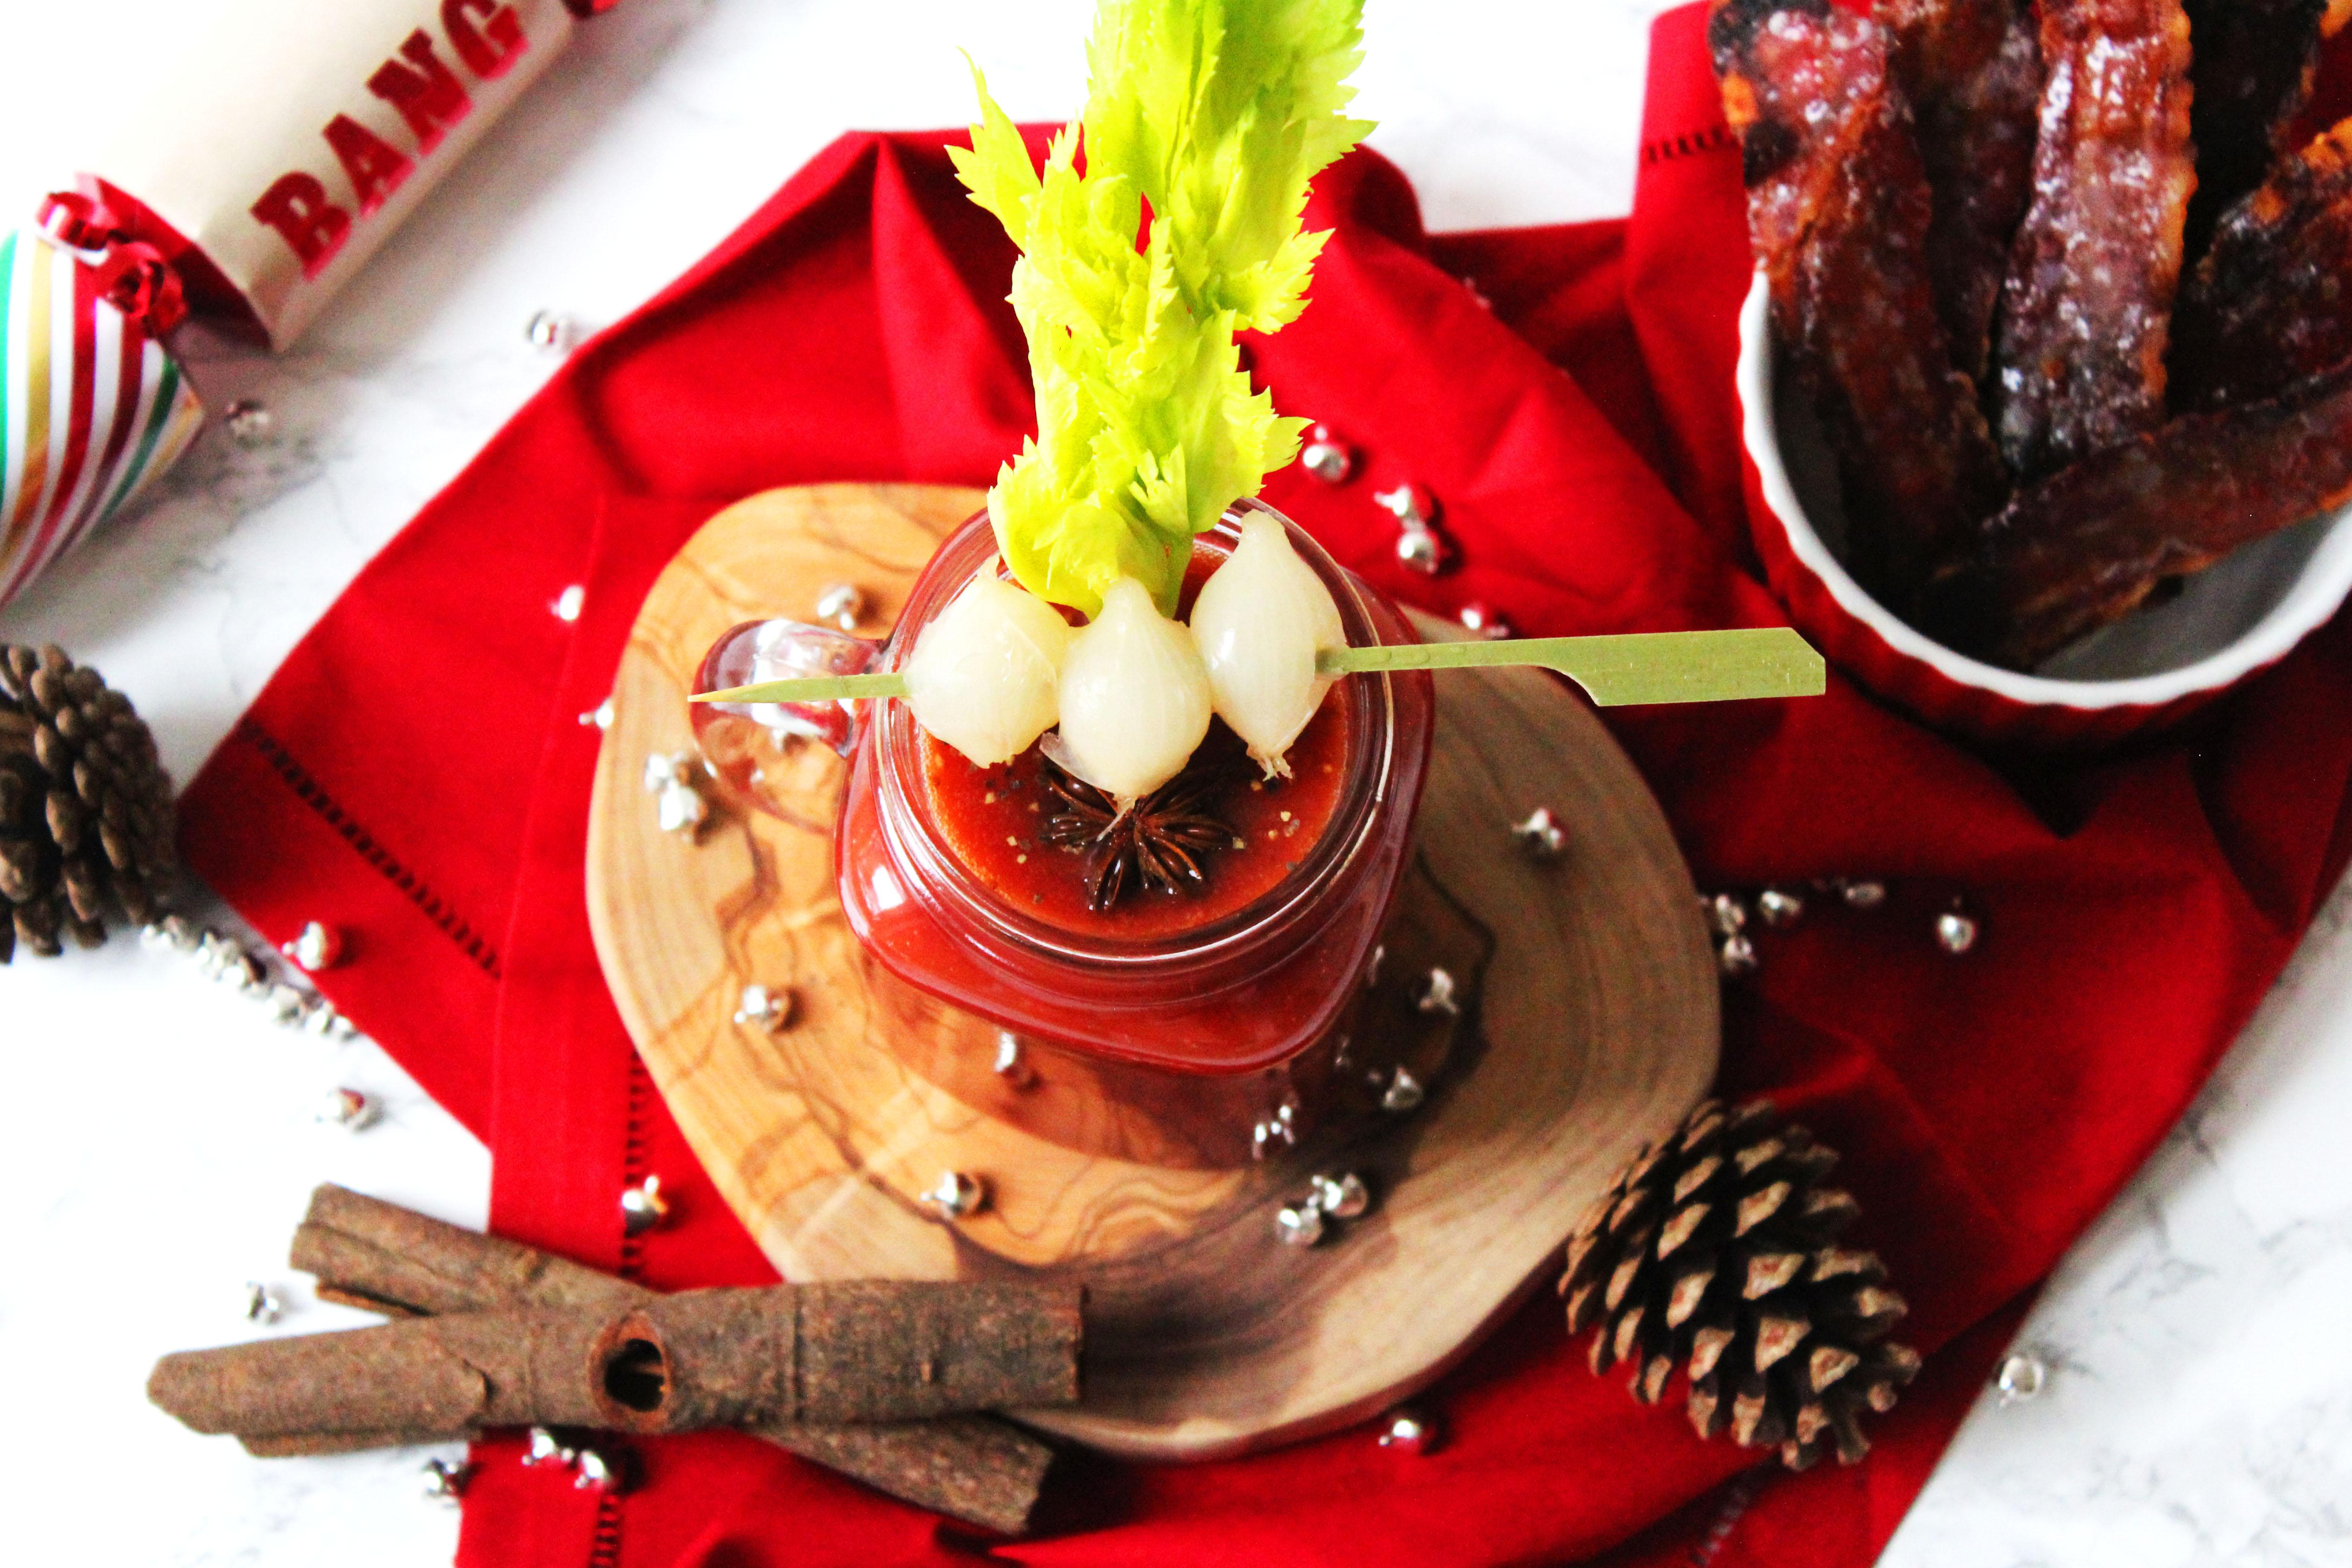 Festive Bloody Mary